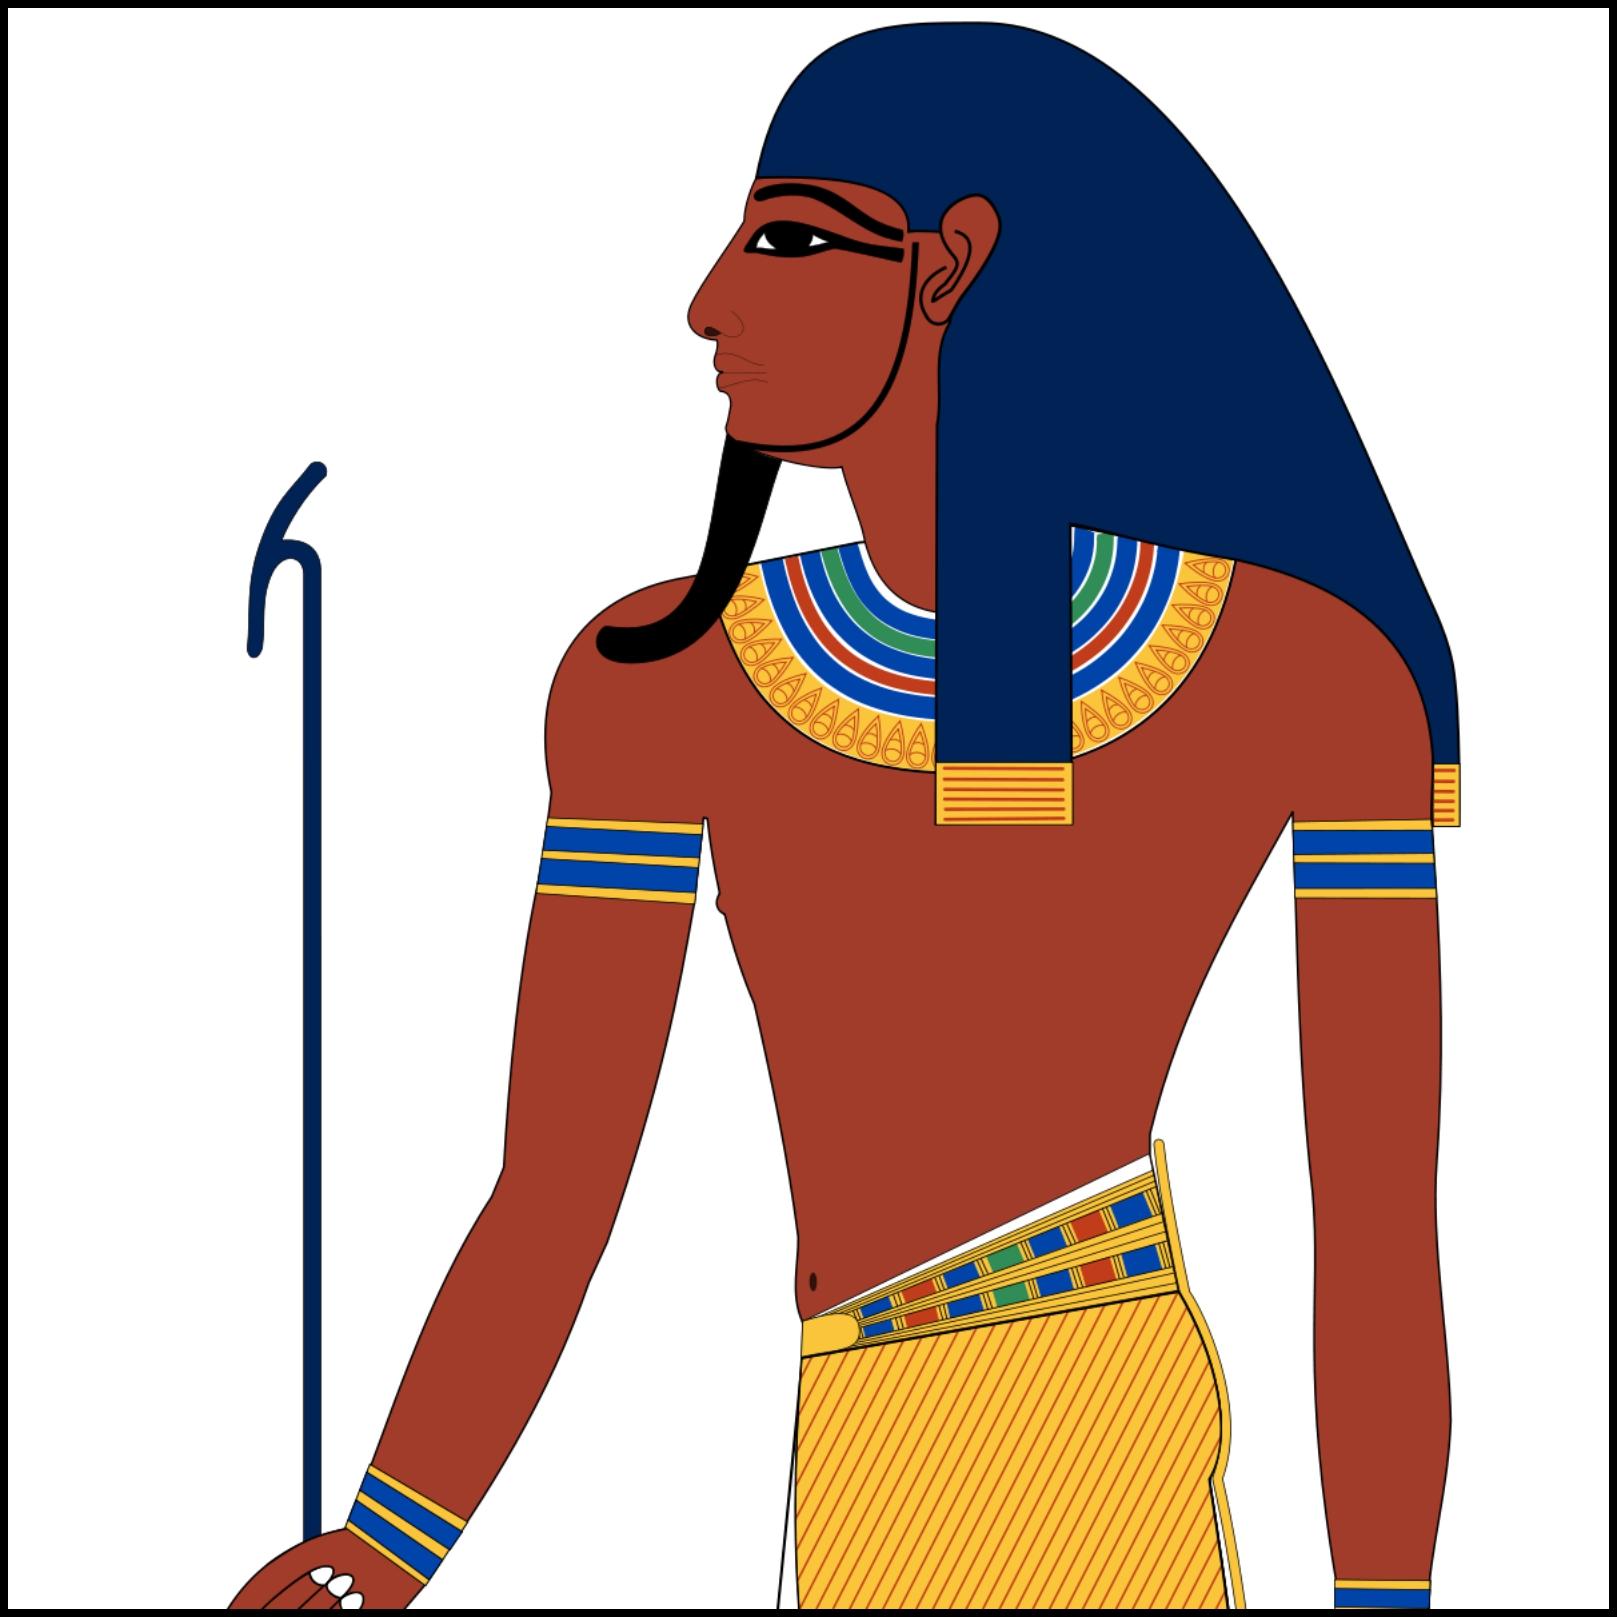 сервис картинки египта атум широко известен узких